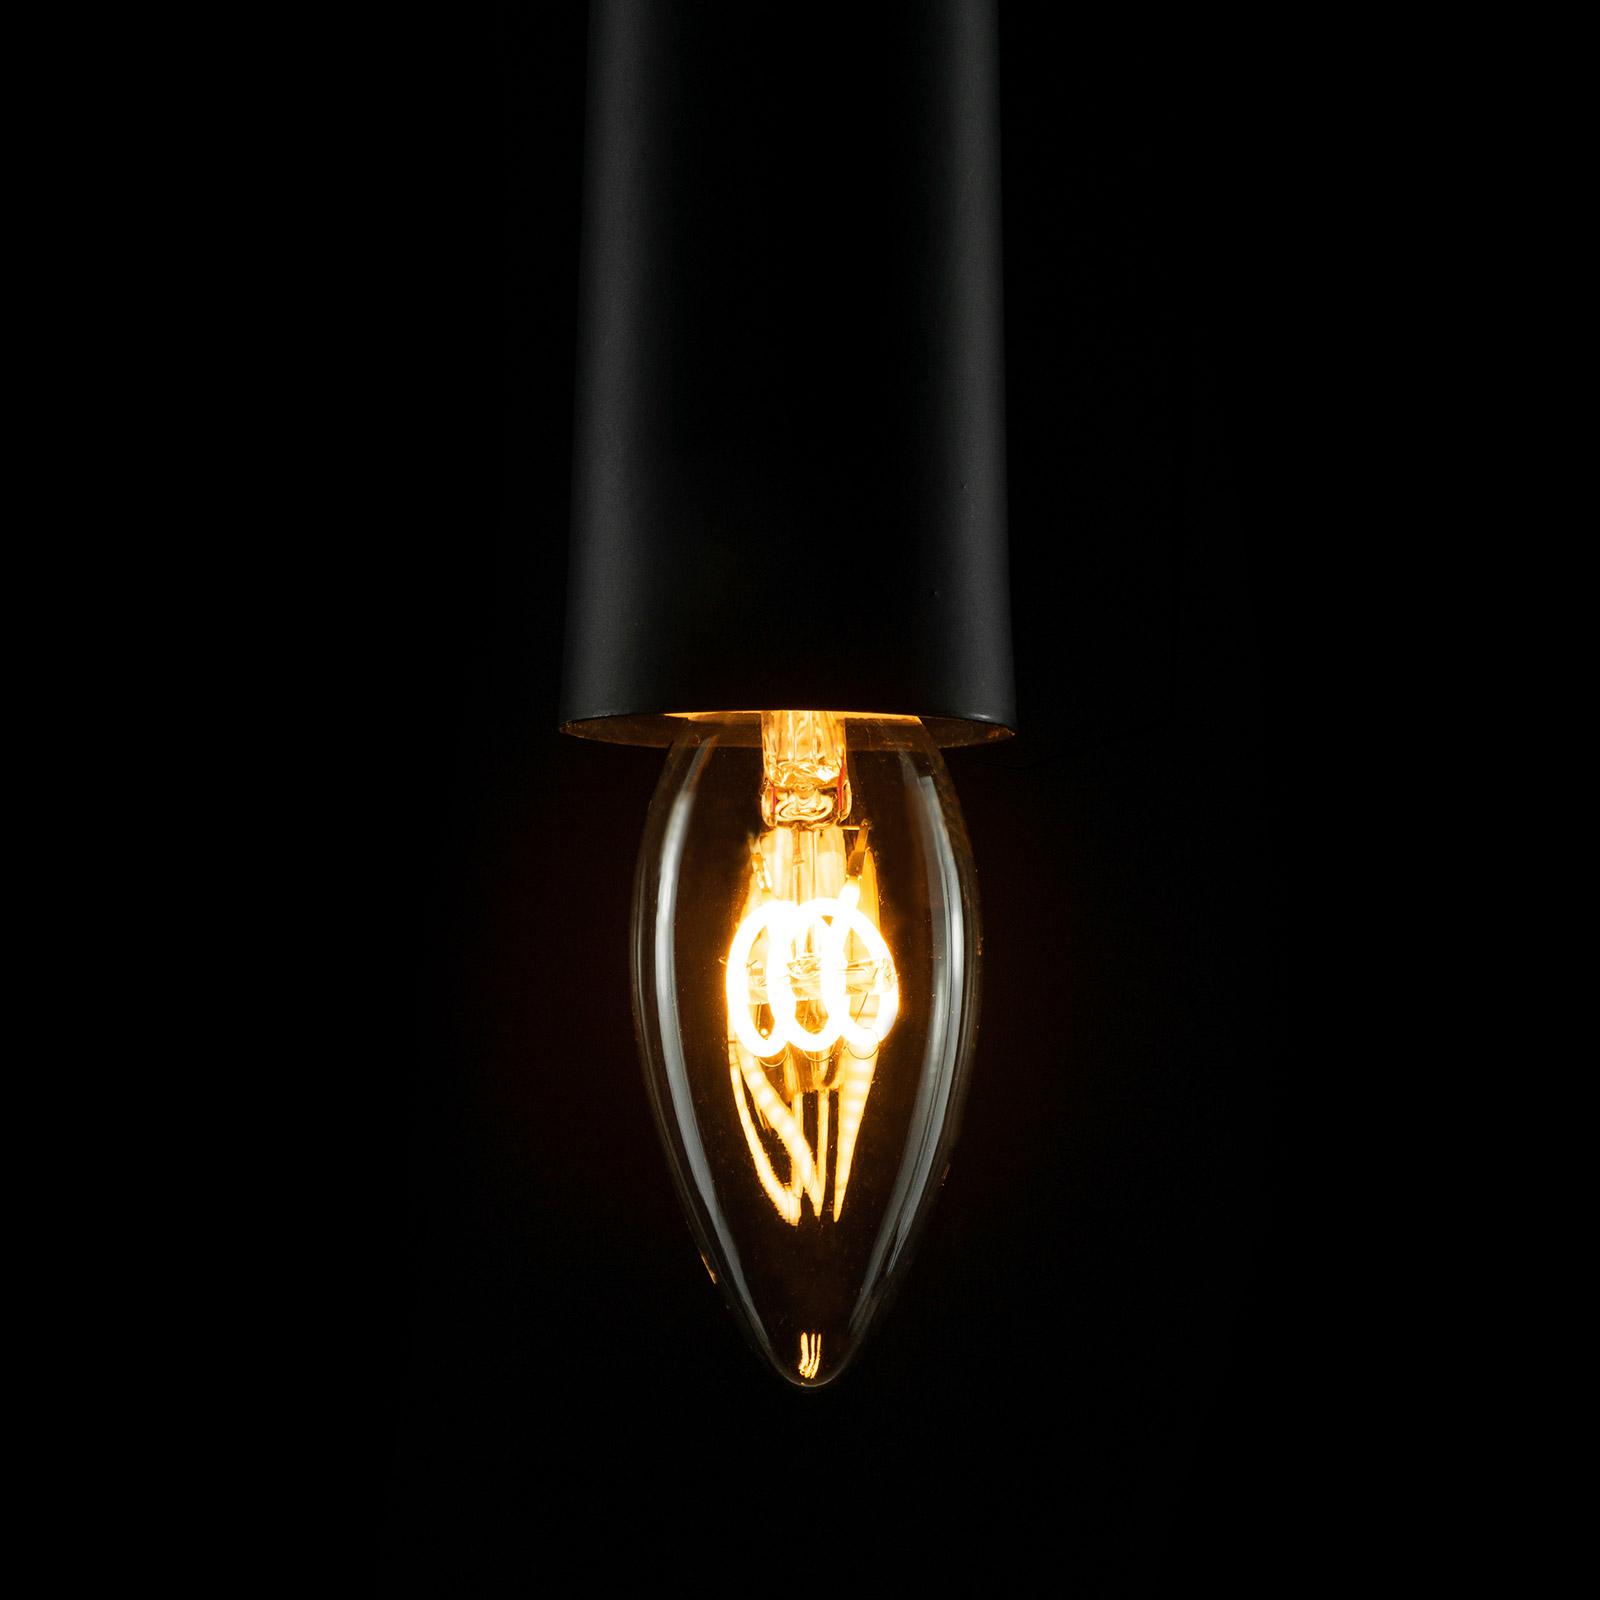 E14 2,7W 922 LED-Filament-Kerzenlampe Curved Line